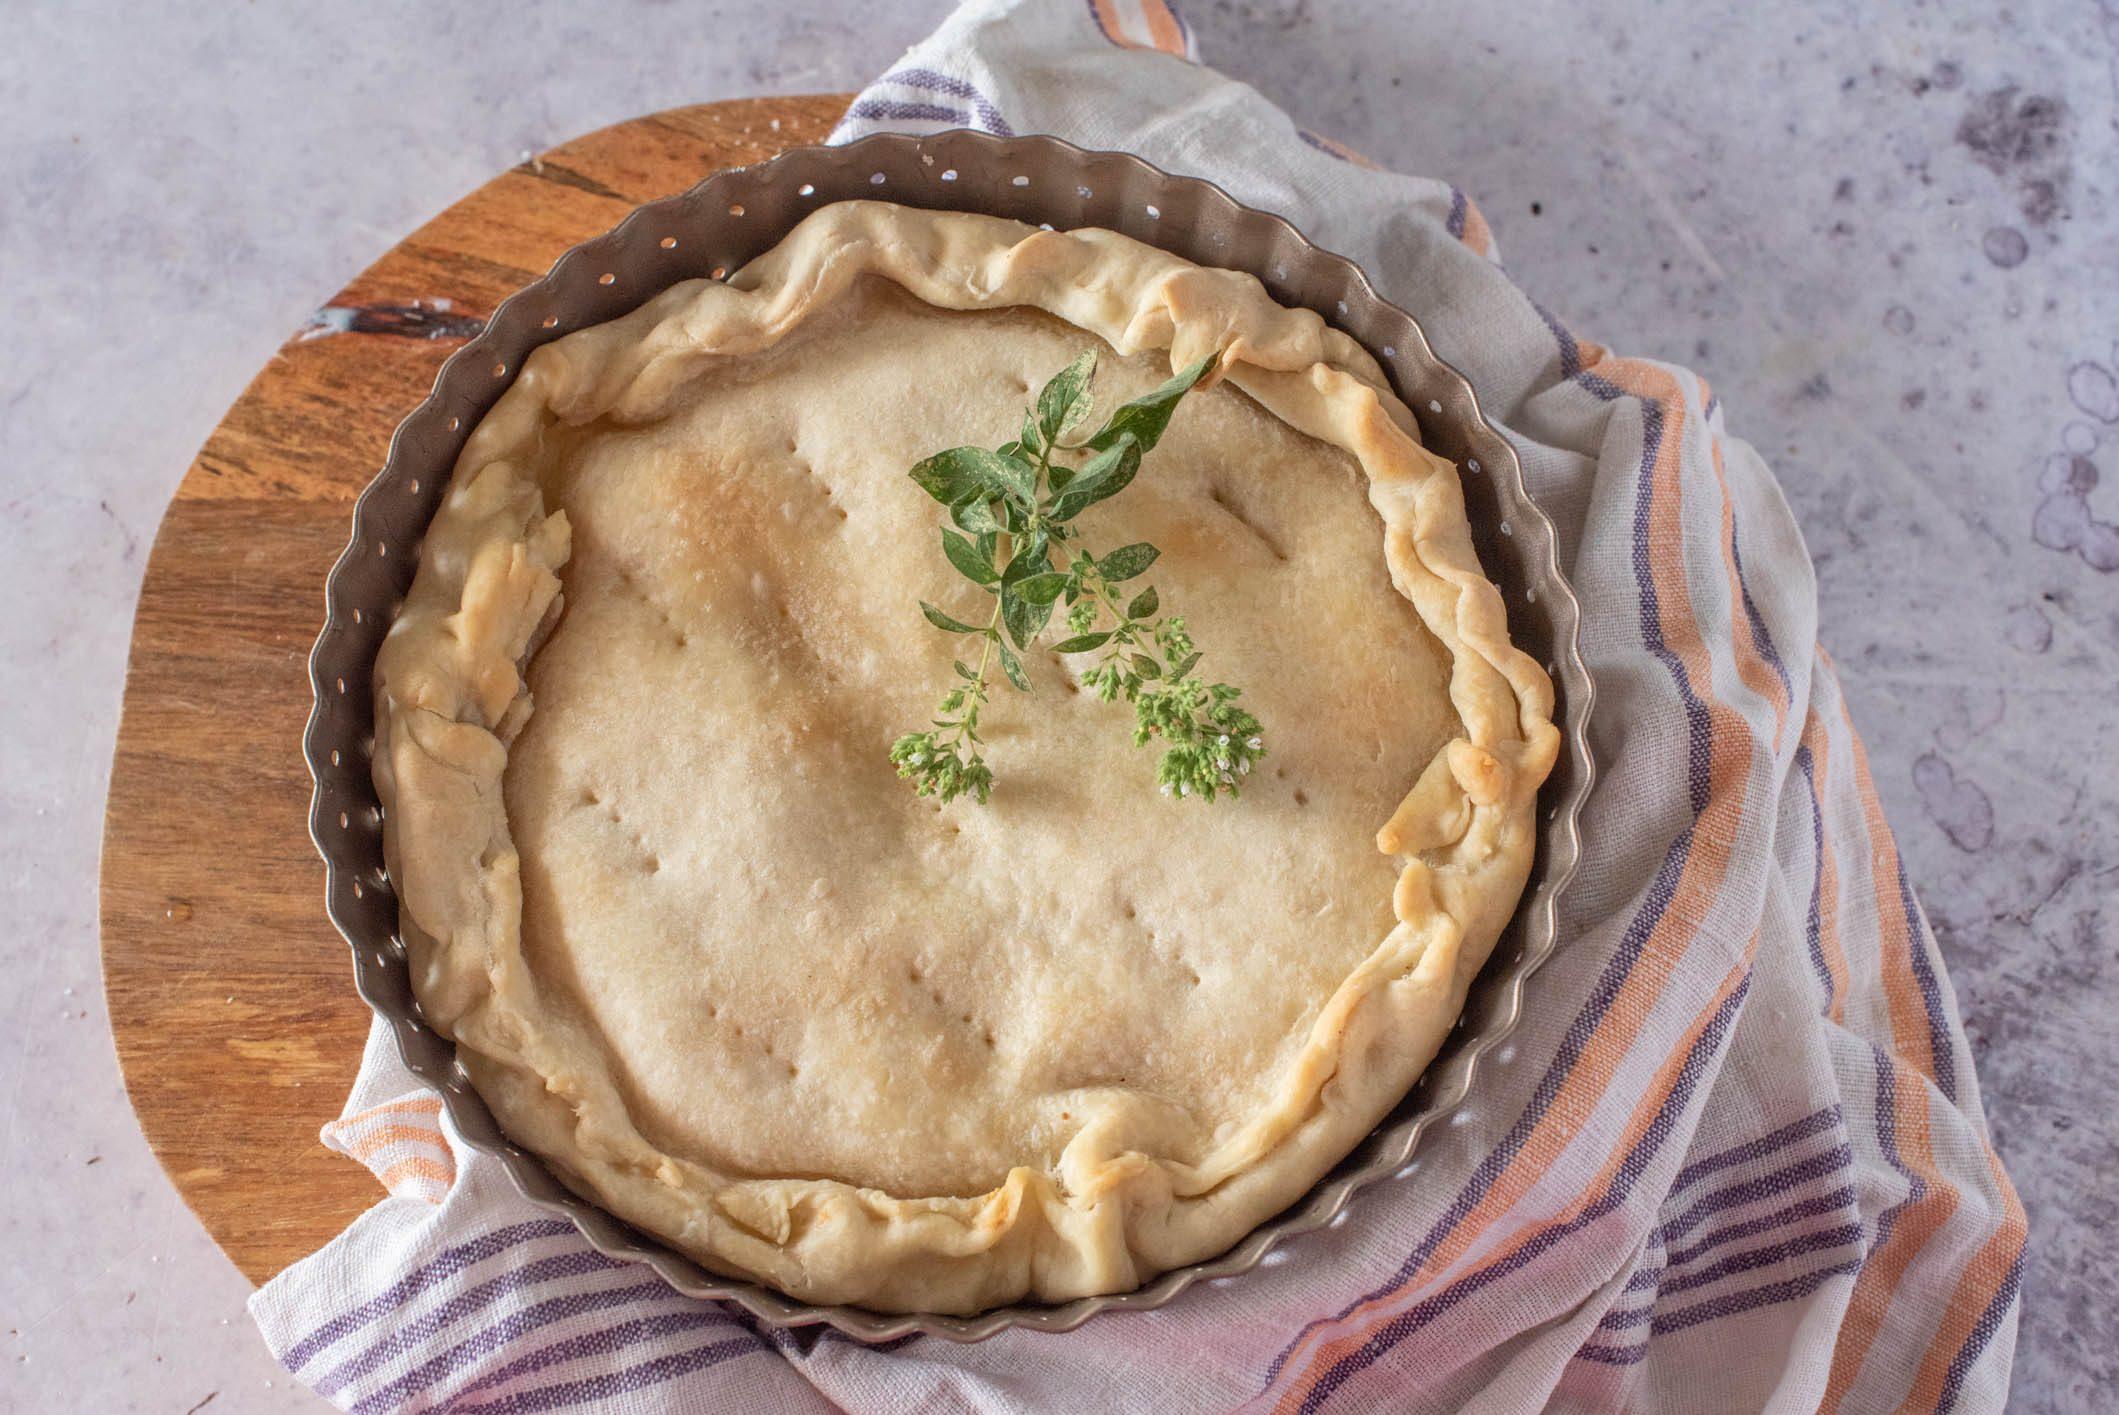 Torta de gee: la ricetta della torta salata tipica ligure